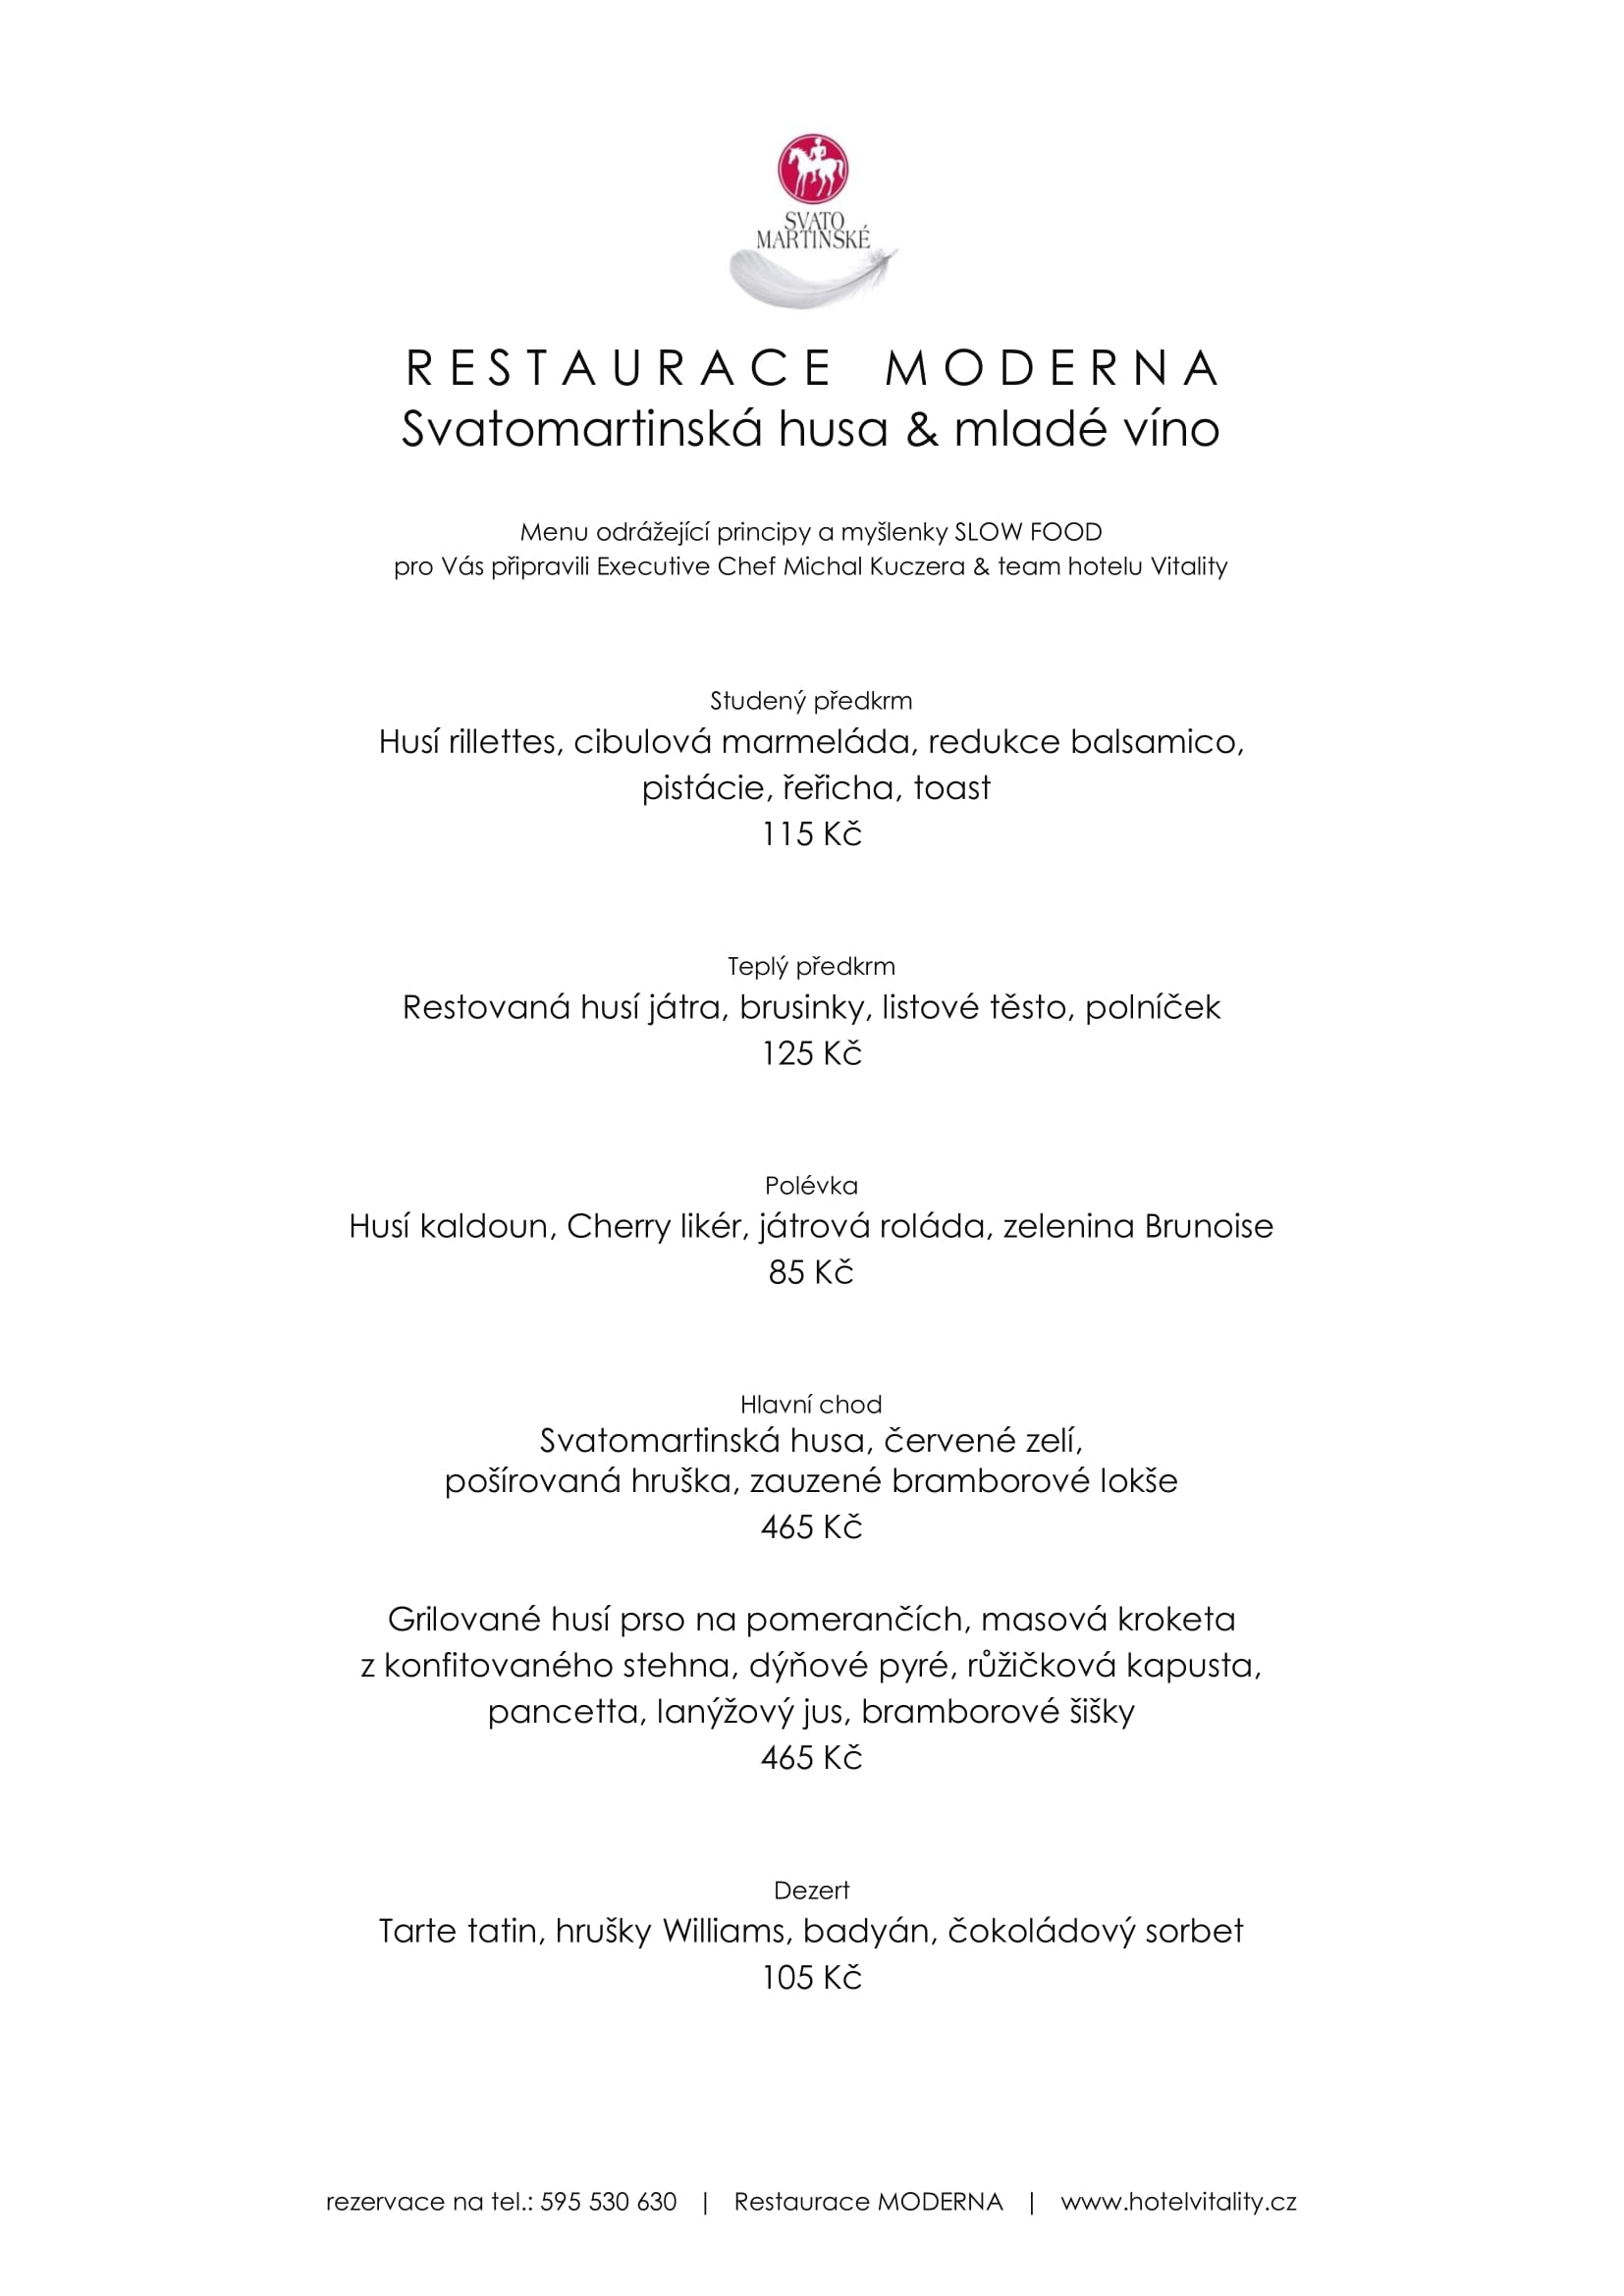 Svatomartinské hody v restauraci Moderna